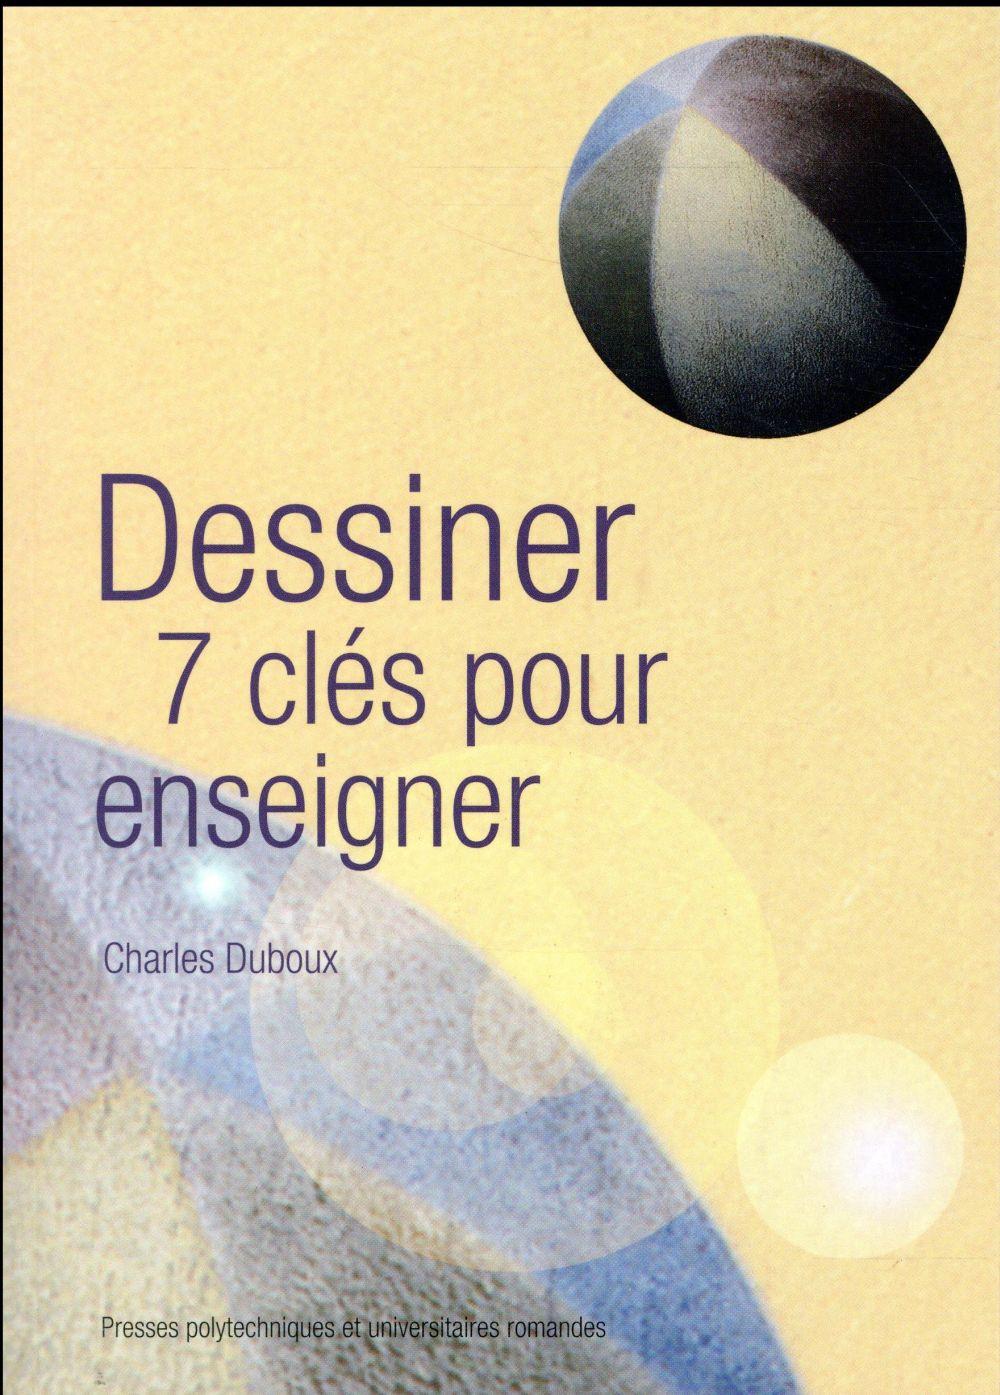 DESSINER  7 CLES POUR ENSEIGNER